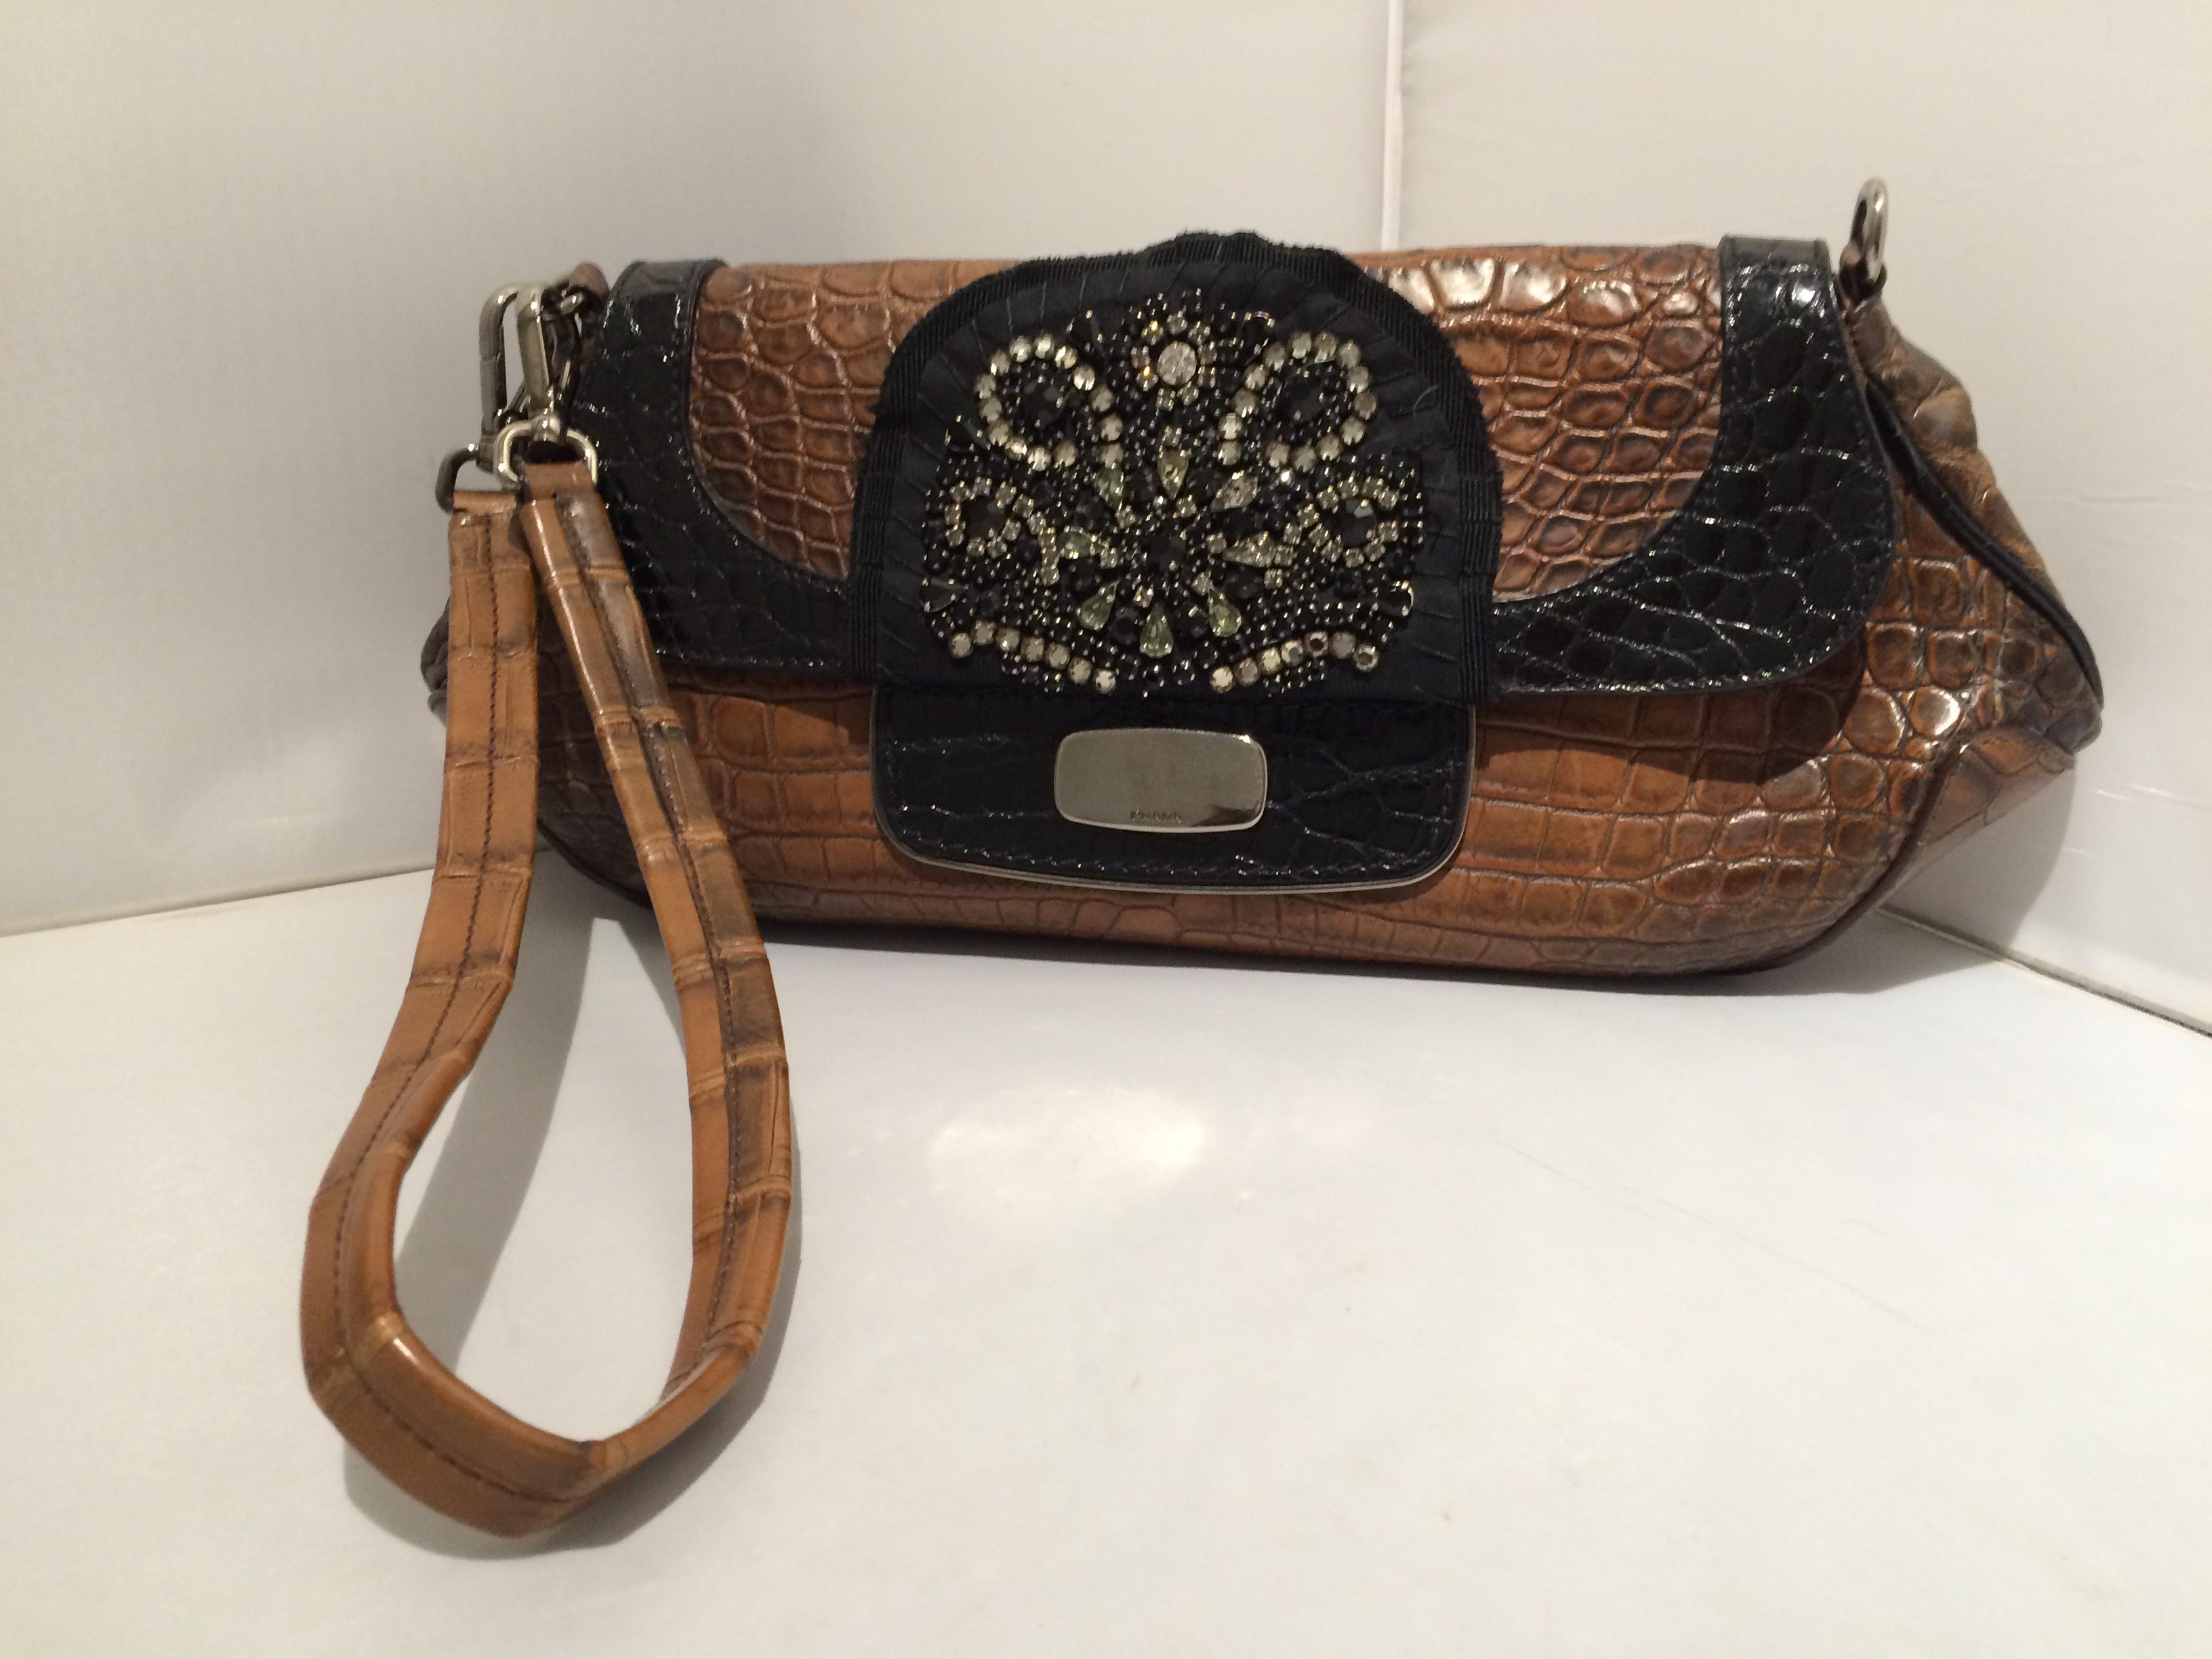 b7277469b6f5 Prada Crocodile Skin Bag | HEWI London